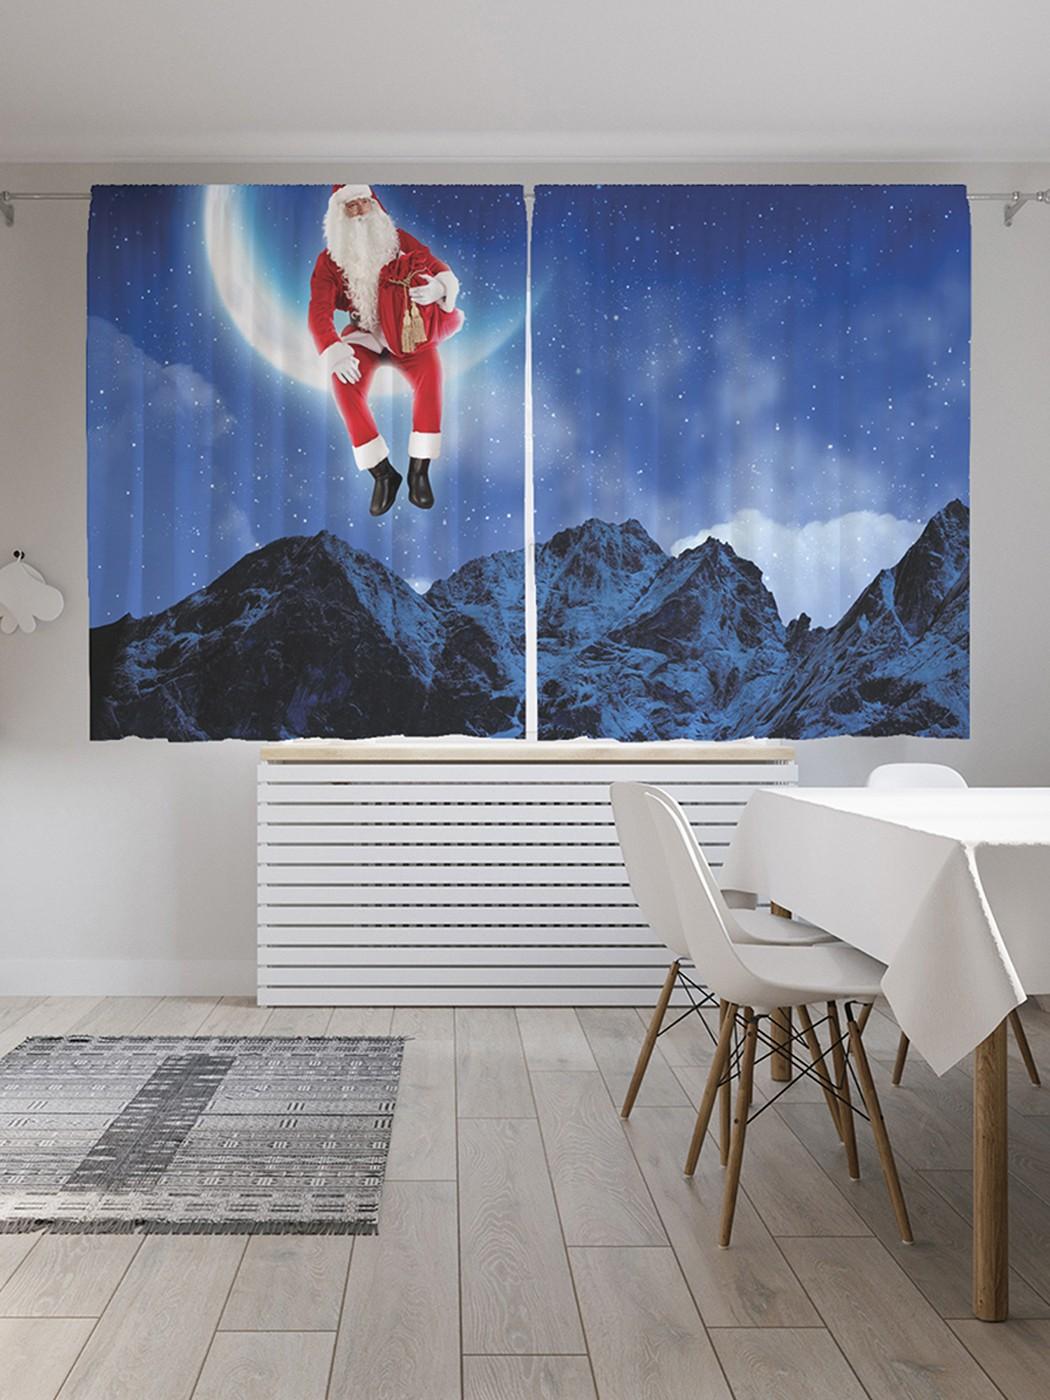 Шторы под лён «Санта на луне», серия Oxford DeLux, 290х180 см фото